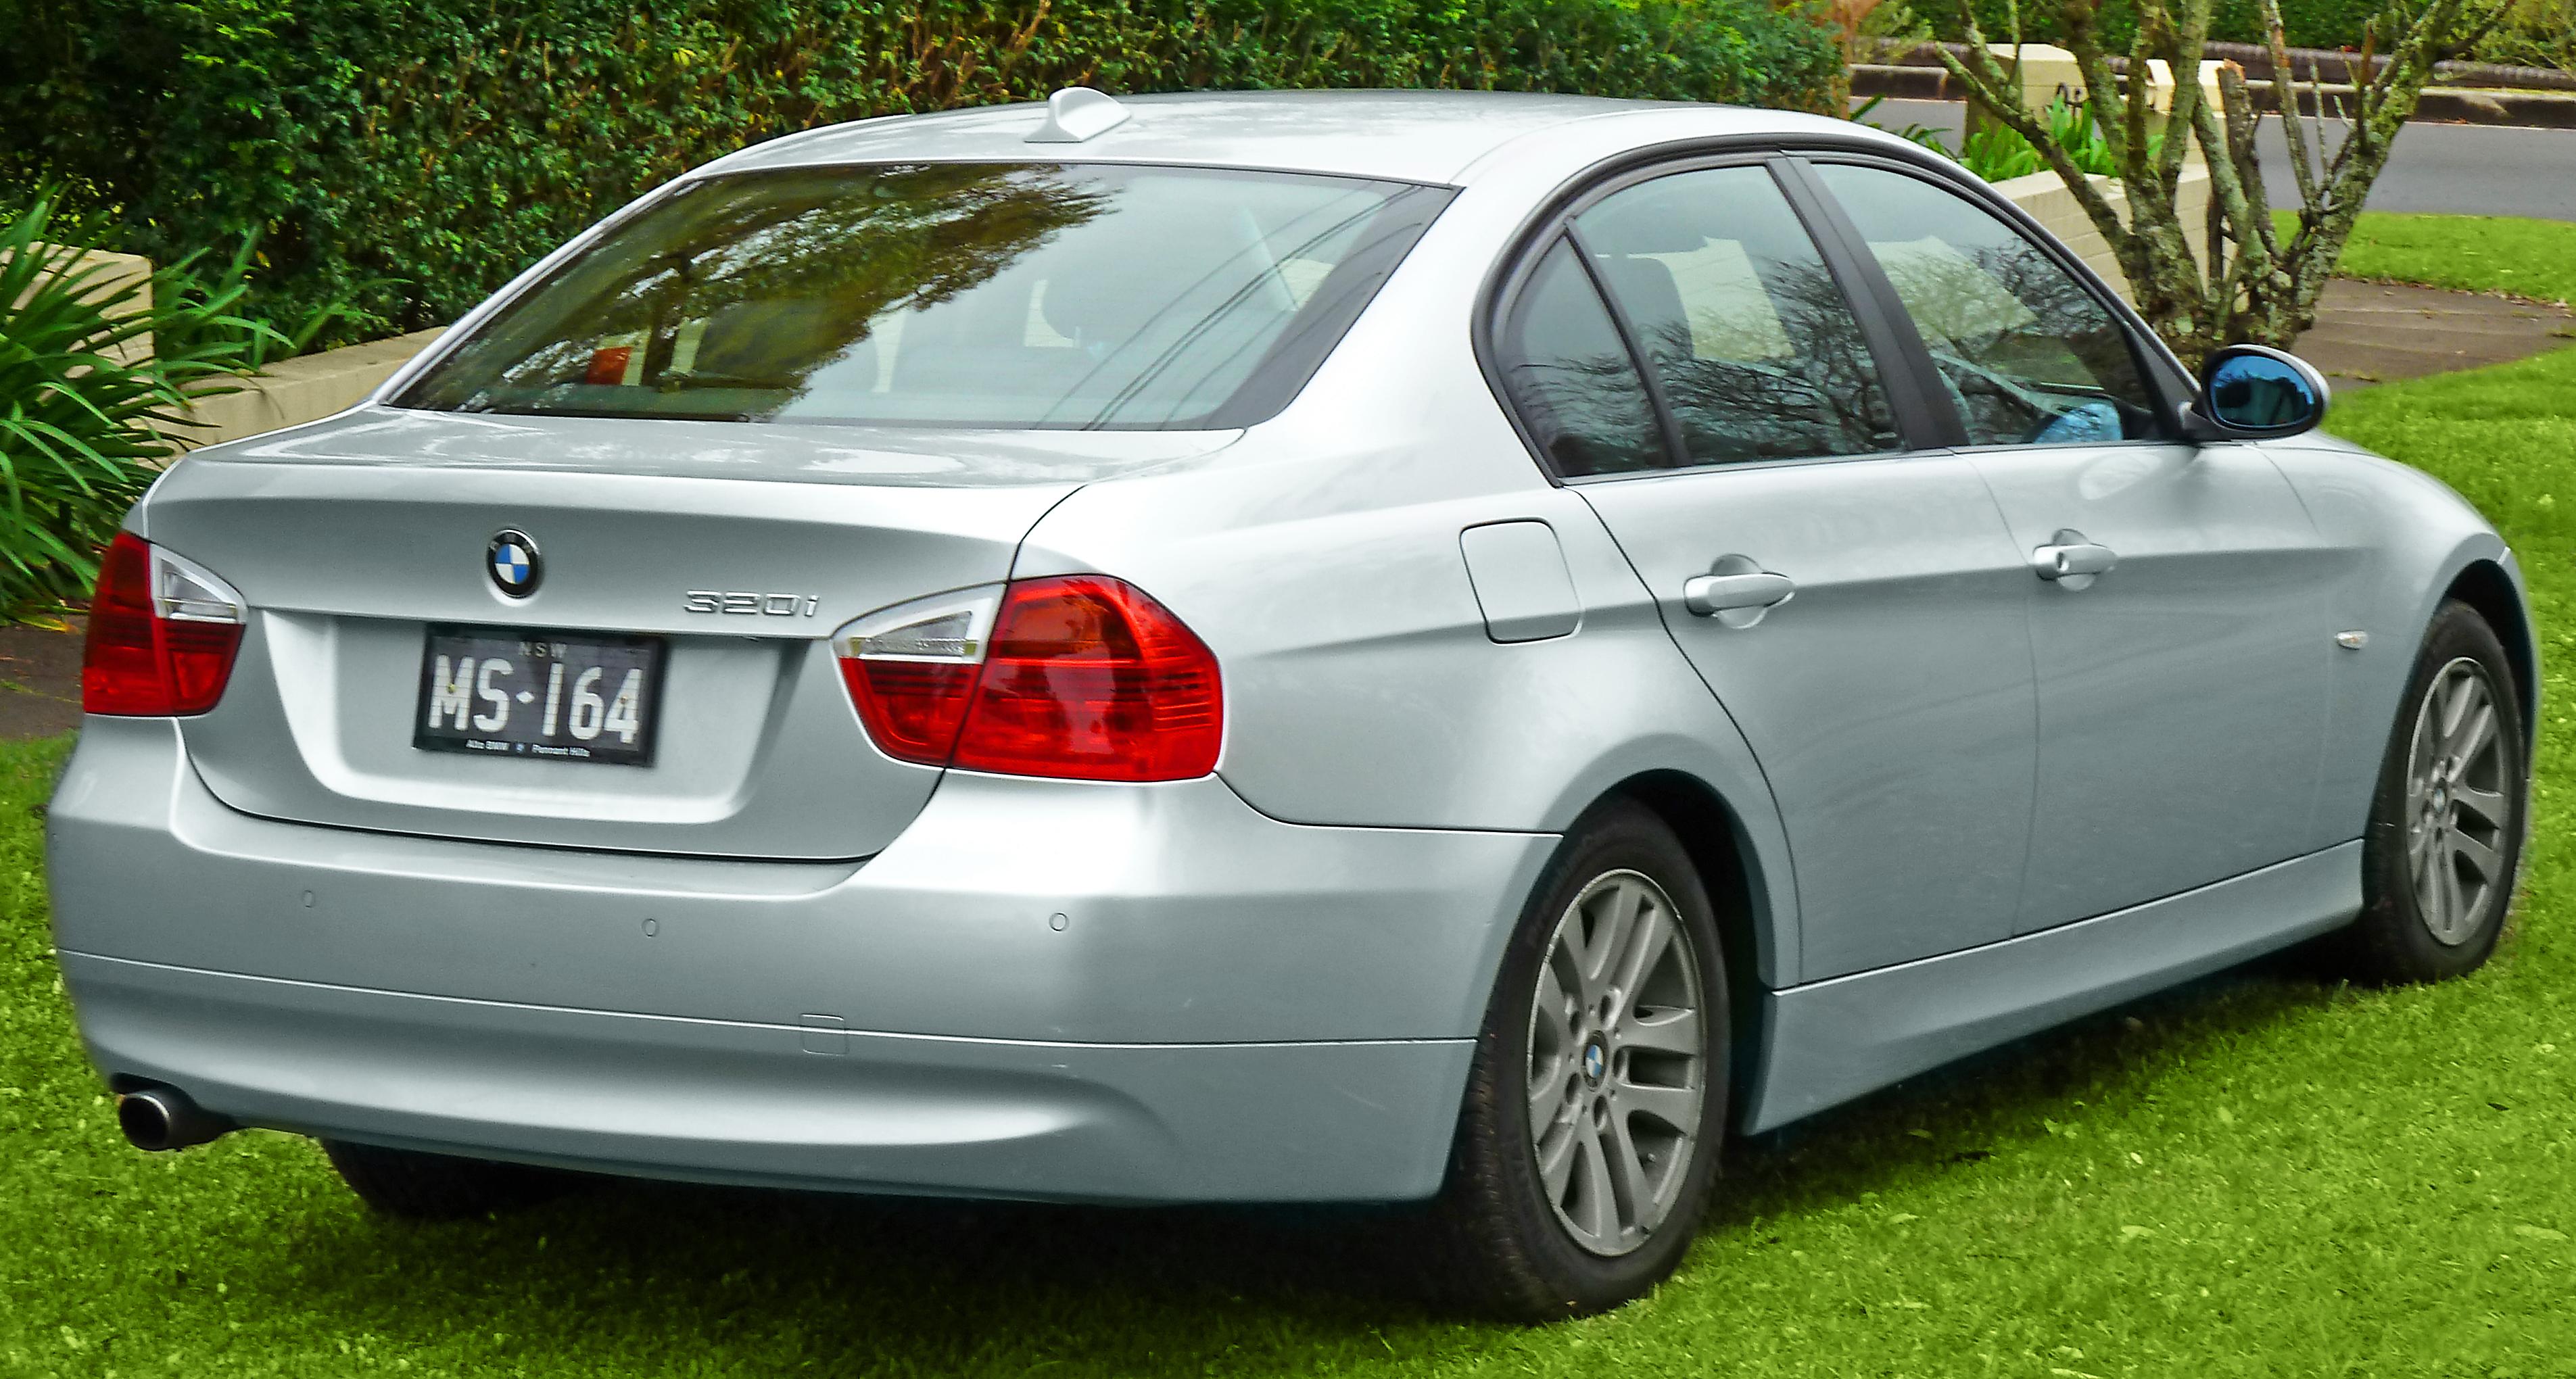 Bmw E90 Wiki >> File:2005-2008 BMW 320i (E90) sedan (2011-07-17) 02.jpg - Wikimedia Commons